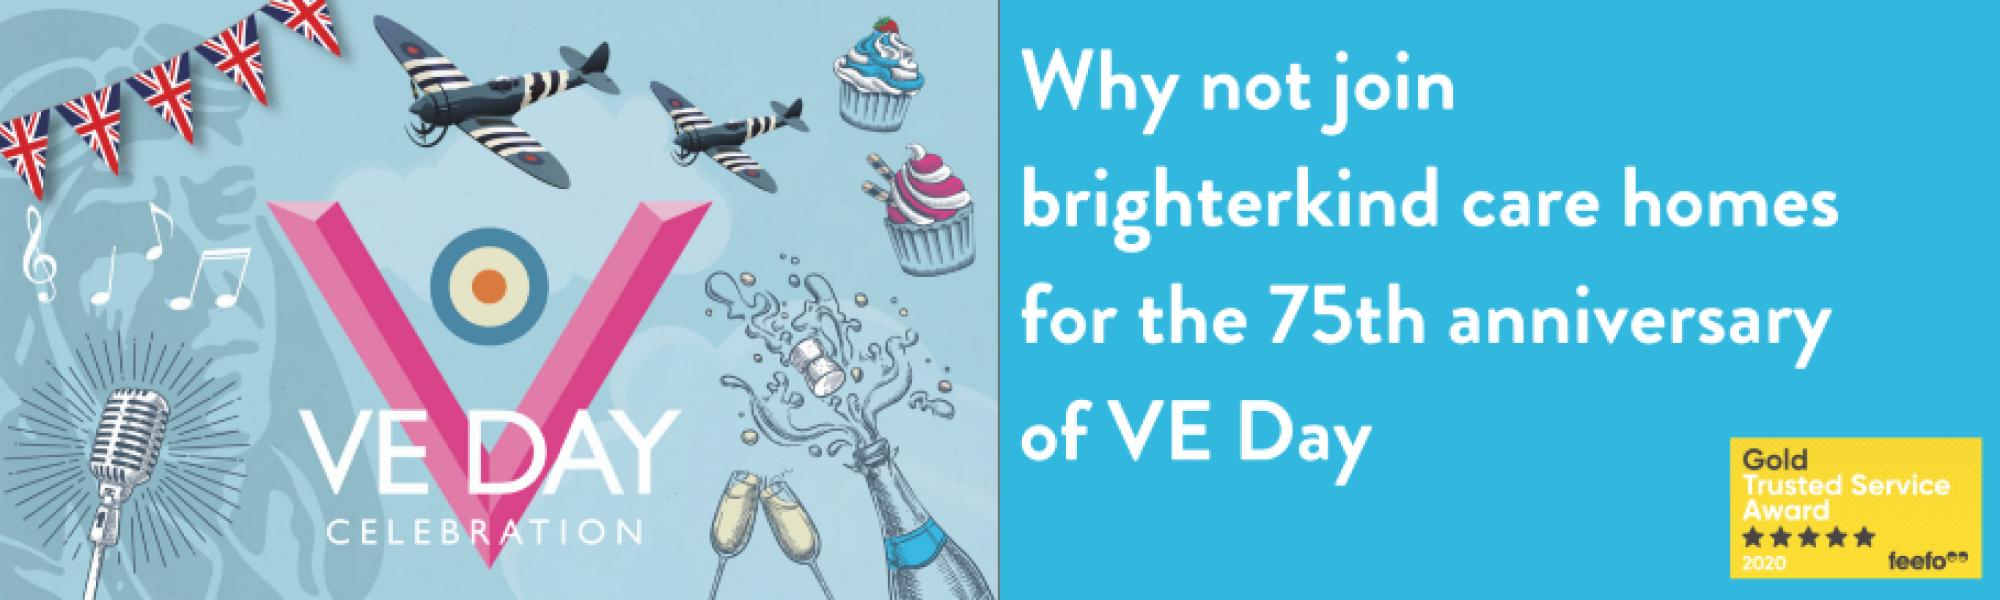 VE Day commemorative celebrations at brighterkind care homes